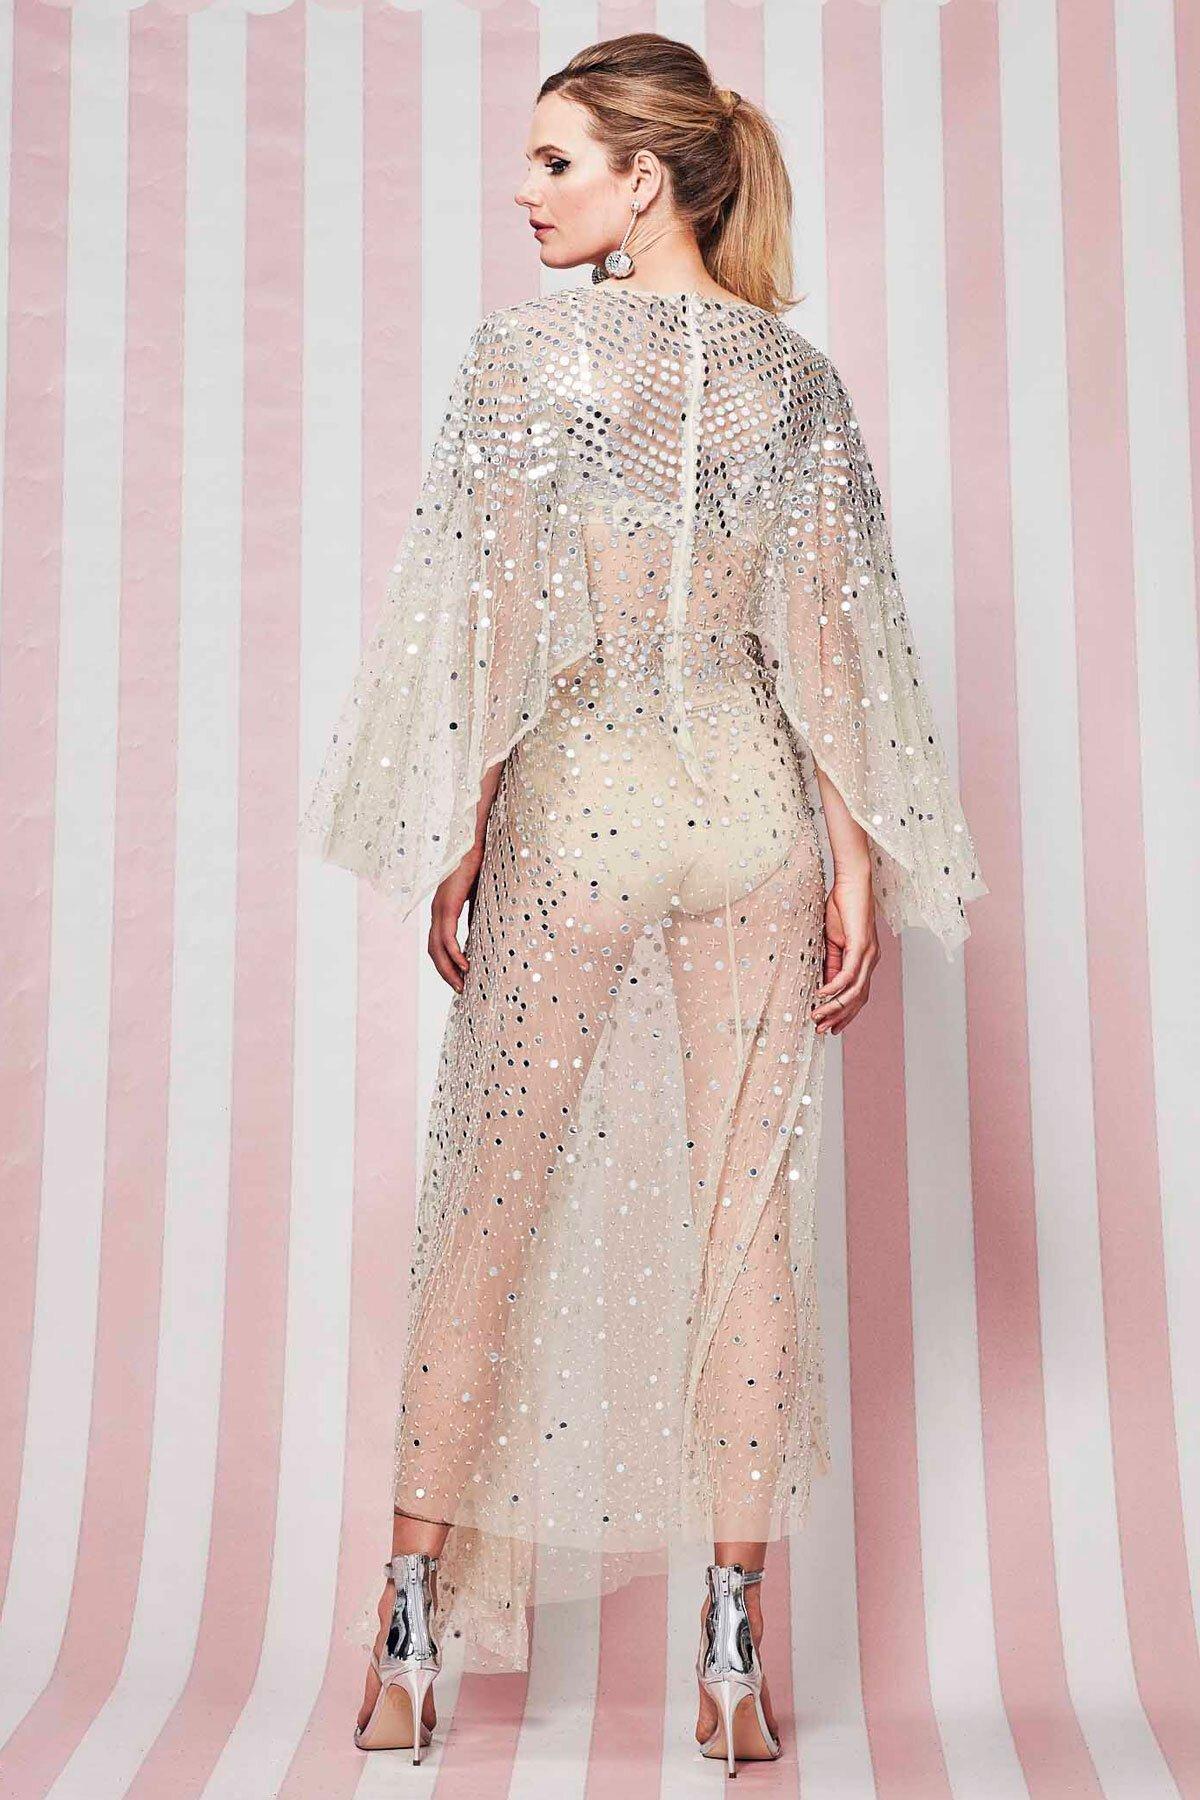 c35b7c80 GOLDEN GLOBE Dress - Trelise Cooper-Sale : Trelise Cooper Online ...